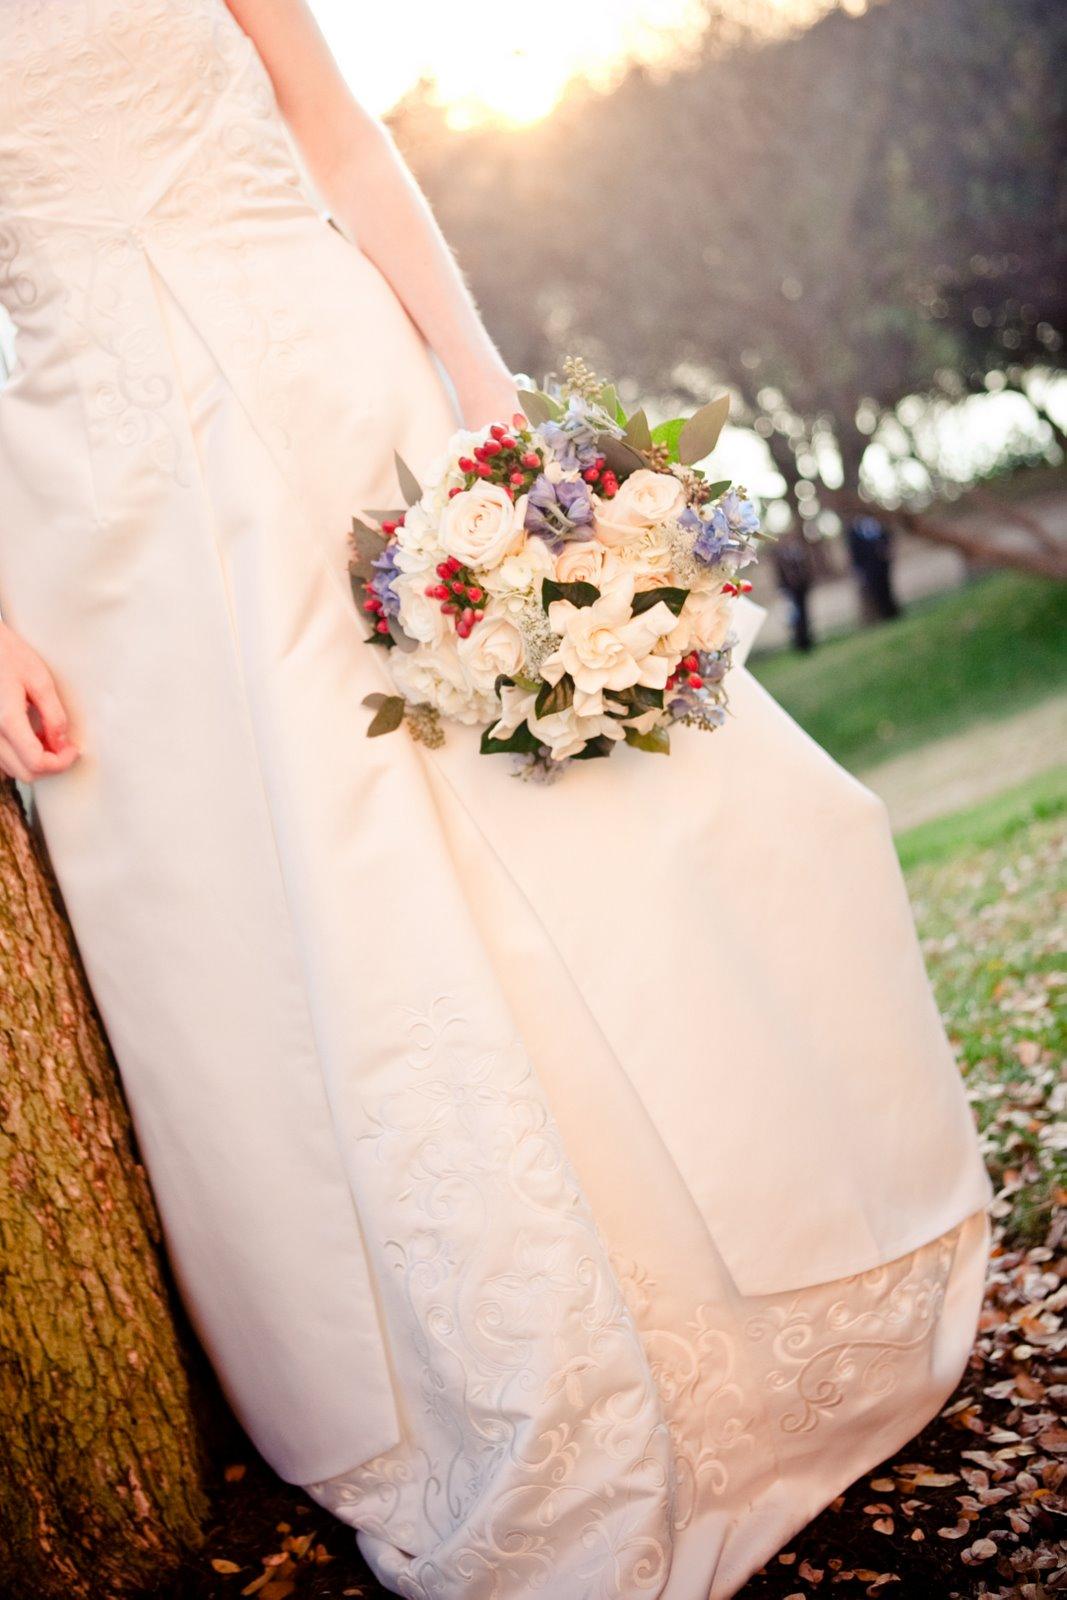 Bouquets of austin winter wedding flowers winter wedding flowers izmirmasajfo